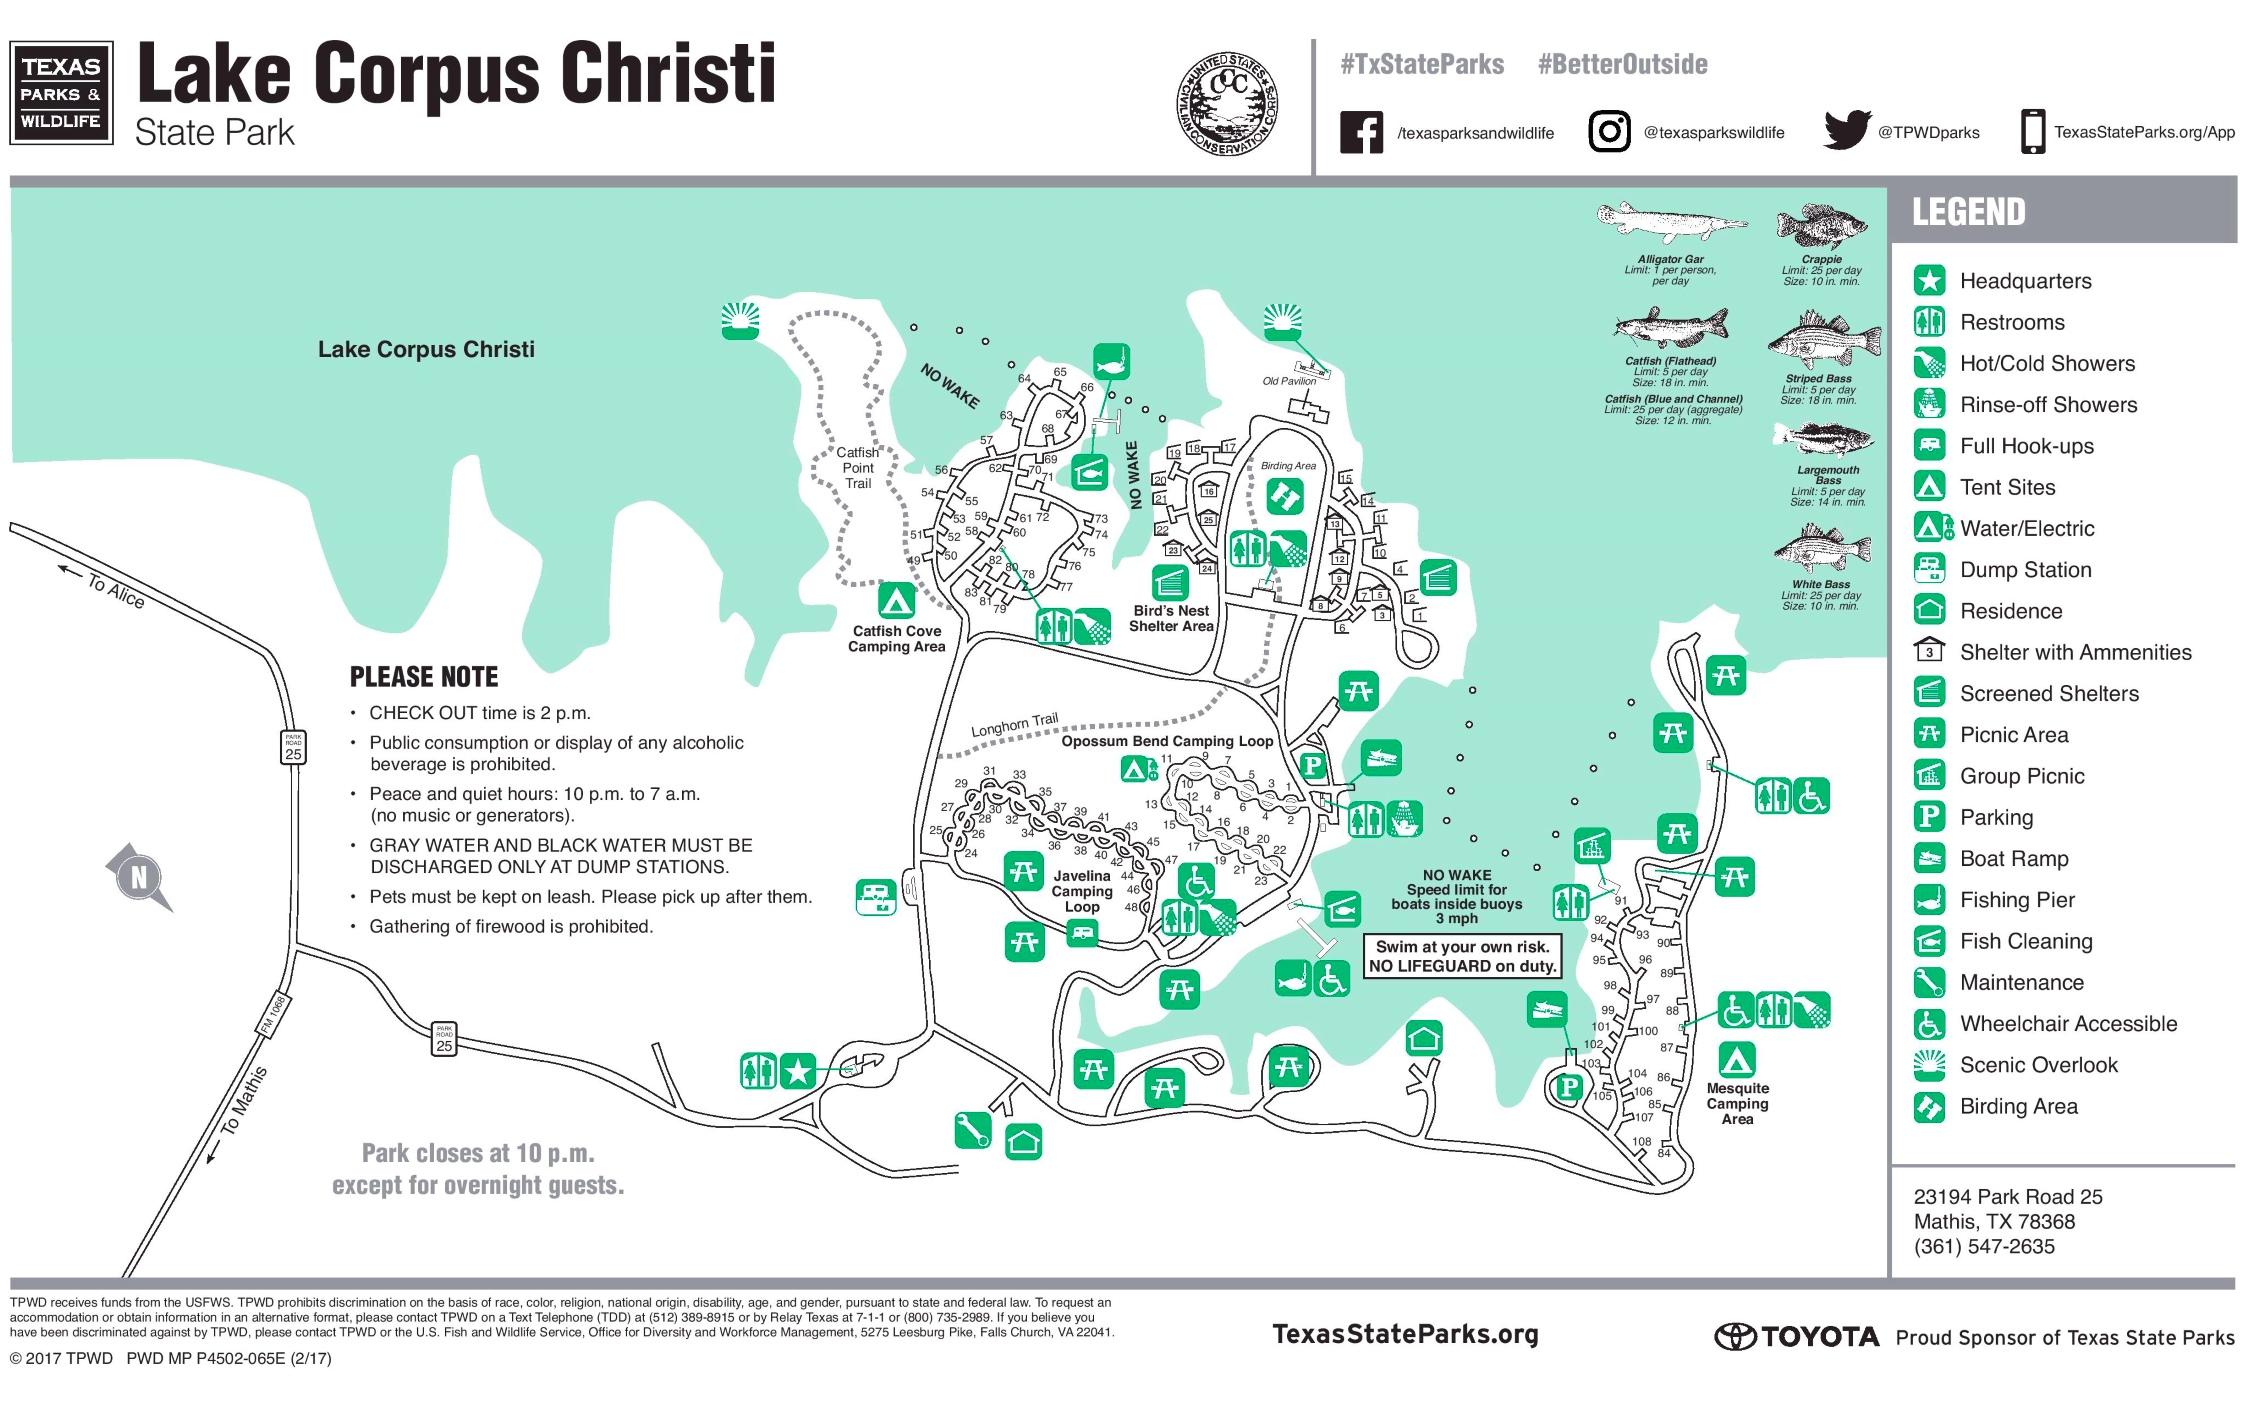 Lake Corpus Christi map on